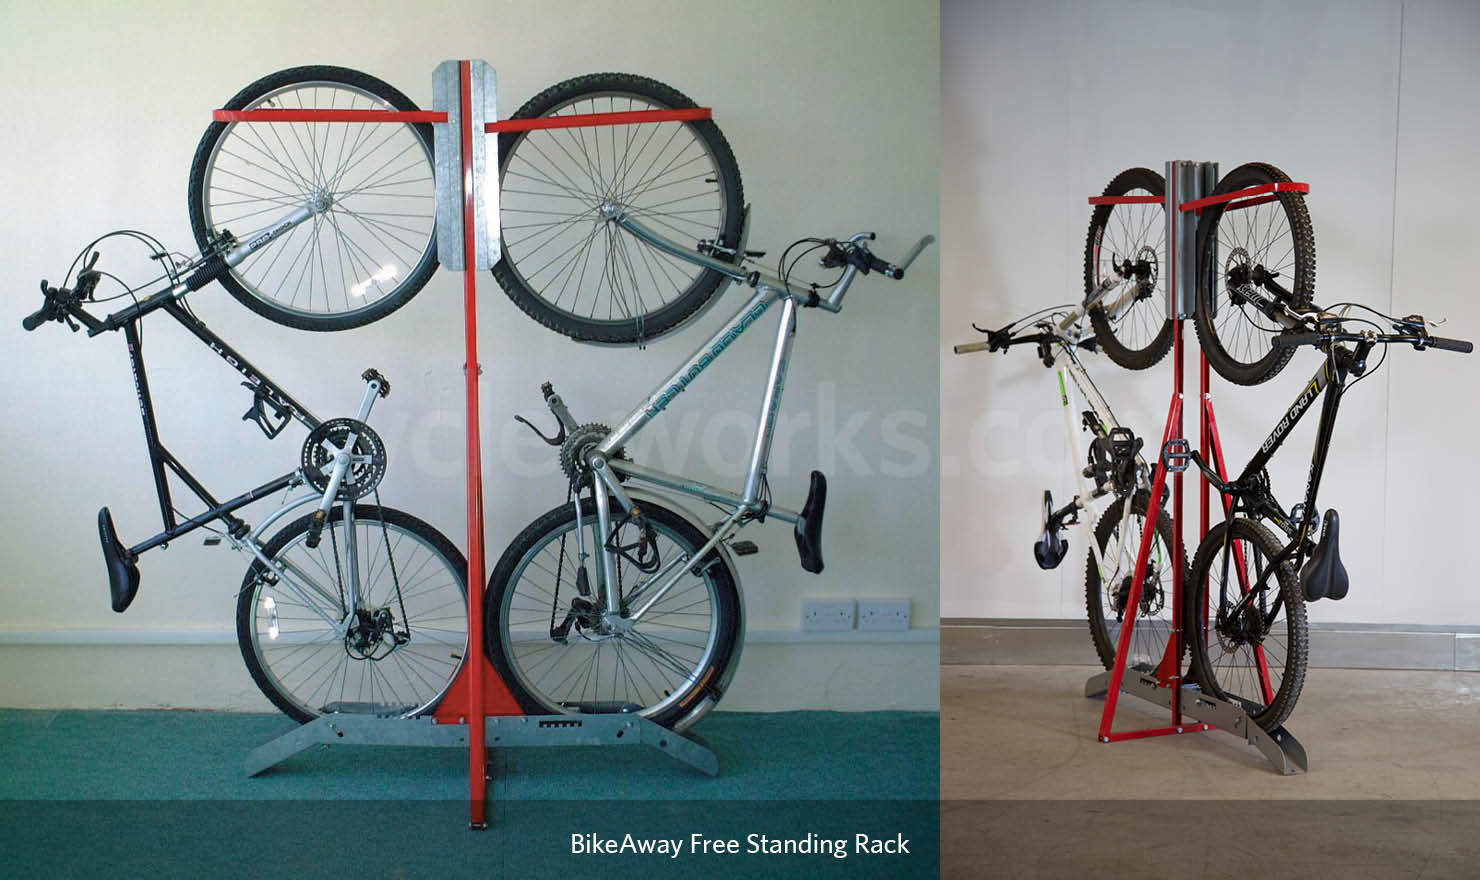 BikeAway Free-standing Rack